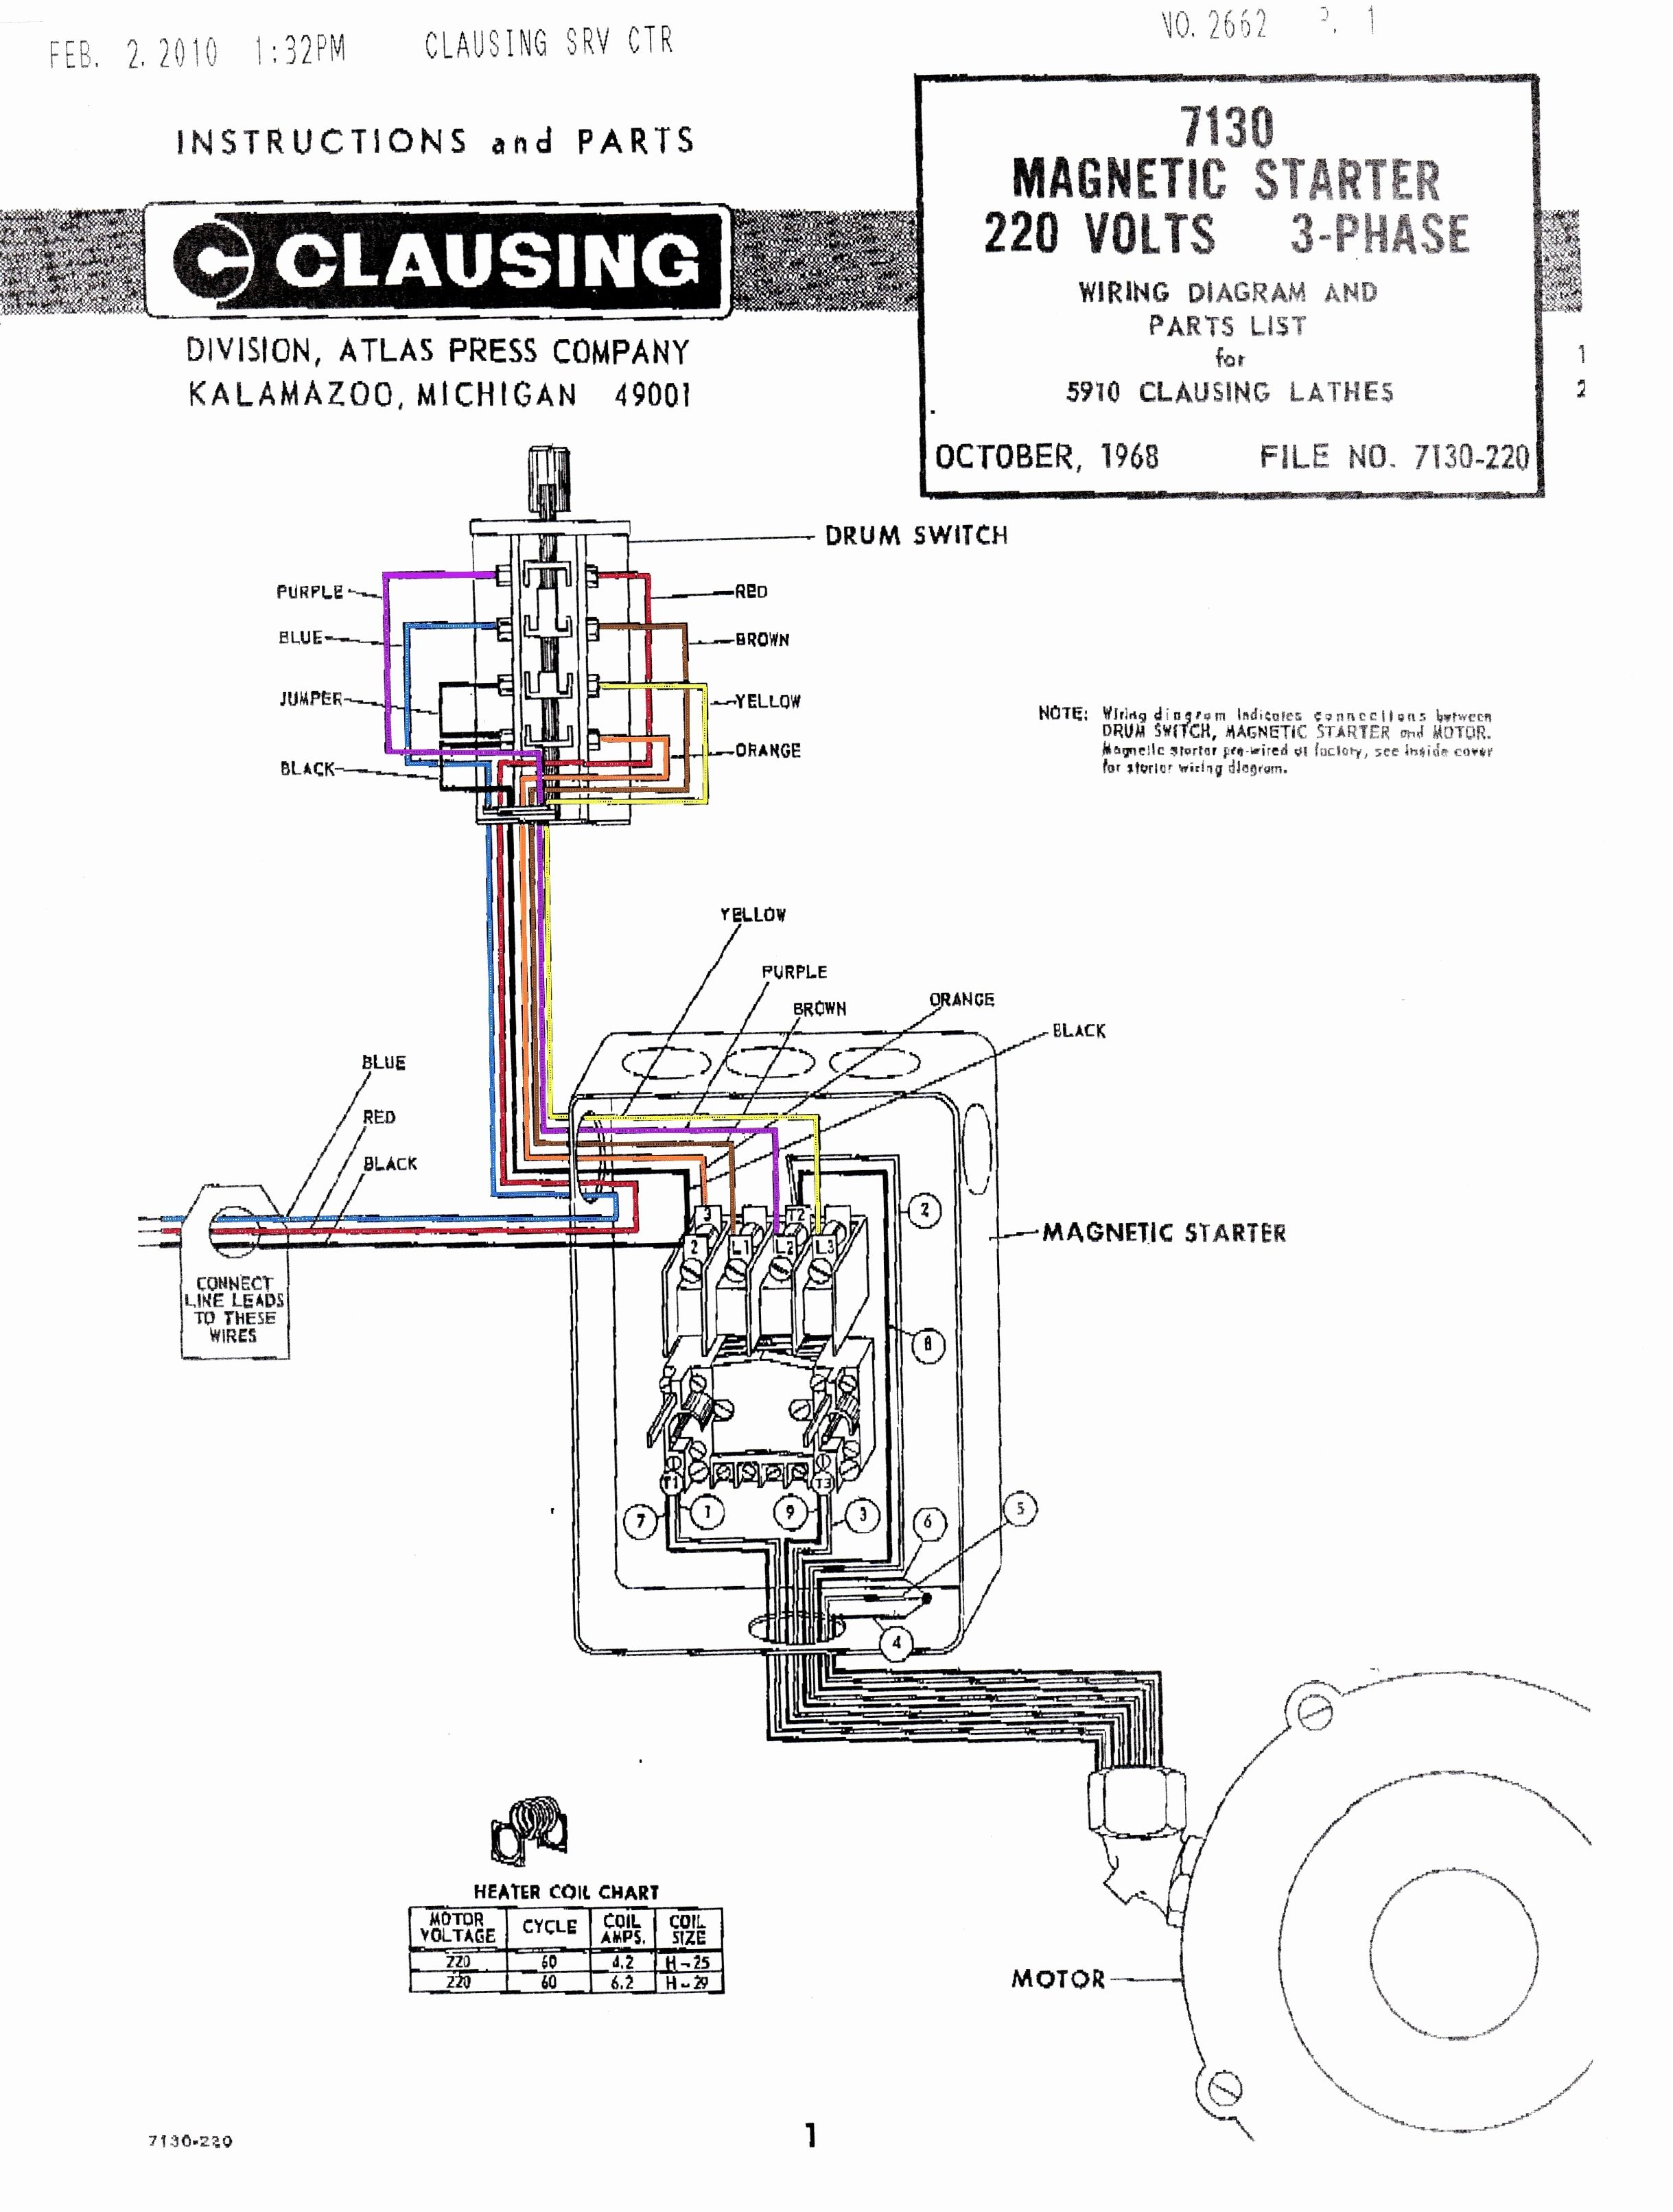 Wire Square D Shunt Diagram - Wiring Diagram Data Oreo - 3 Wire 220 Volt Wiring Diagram